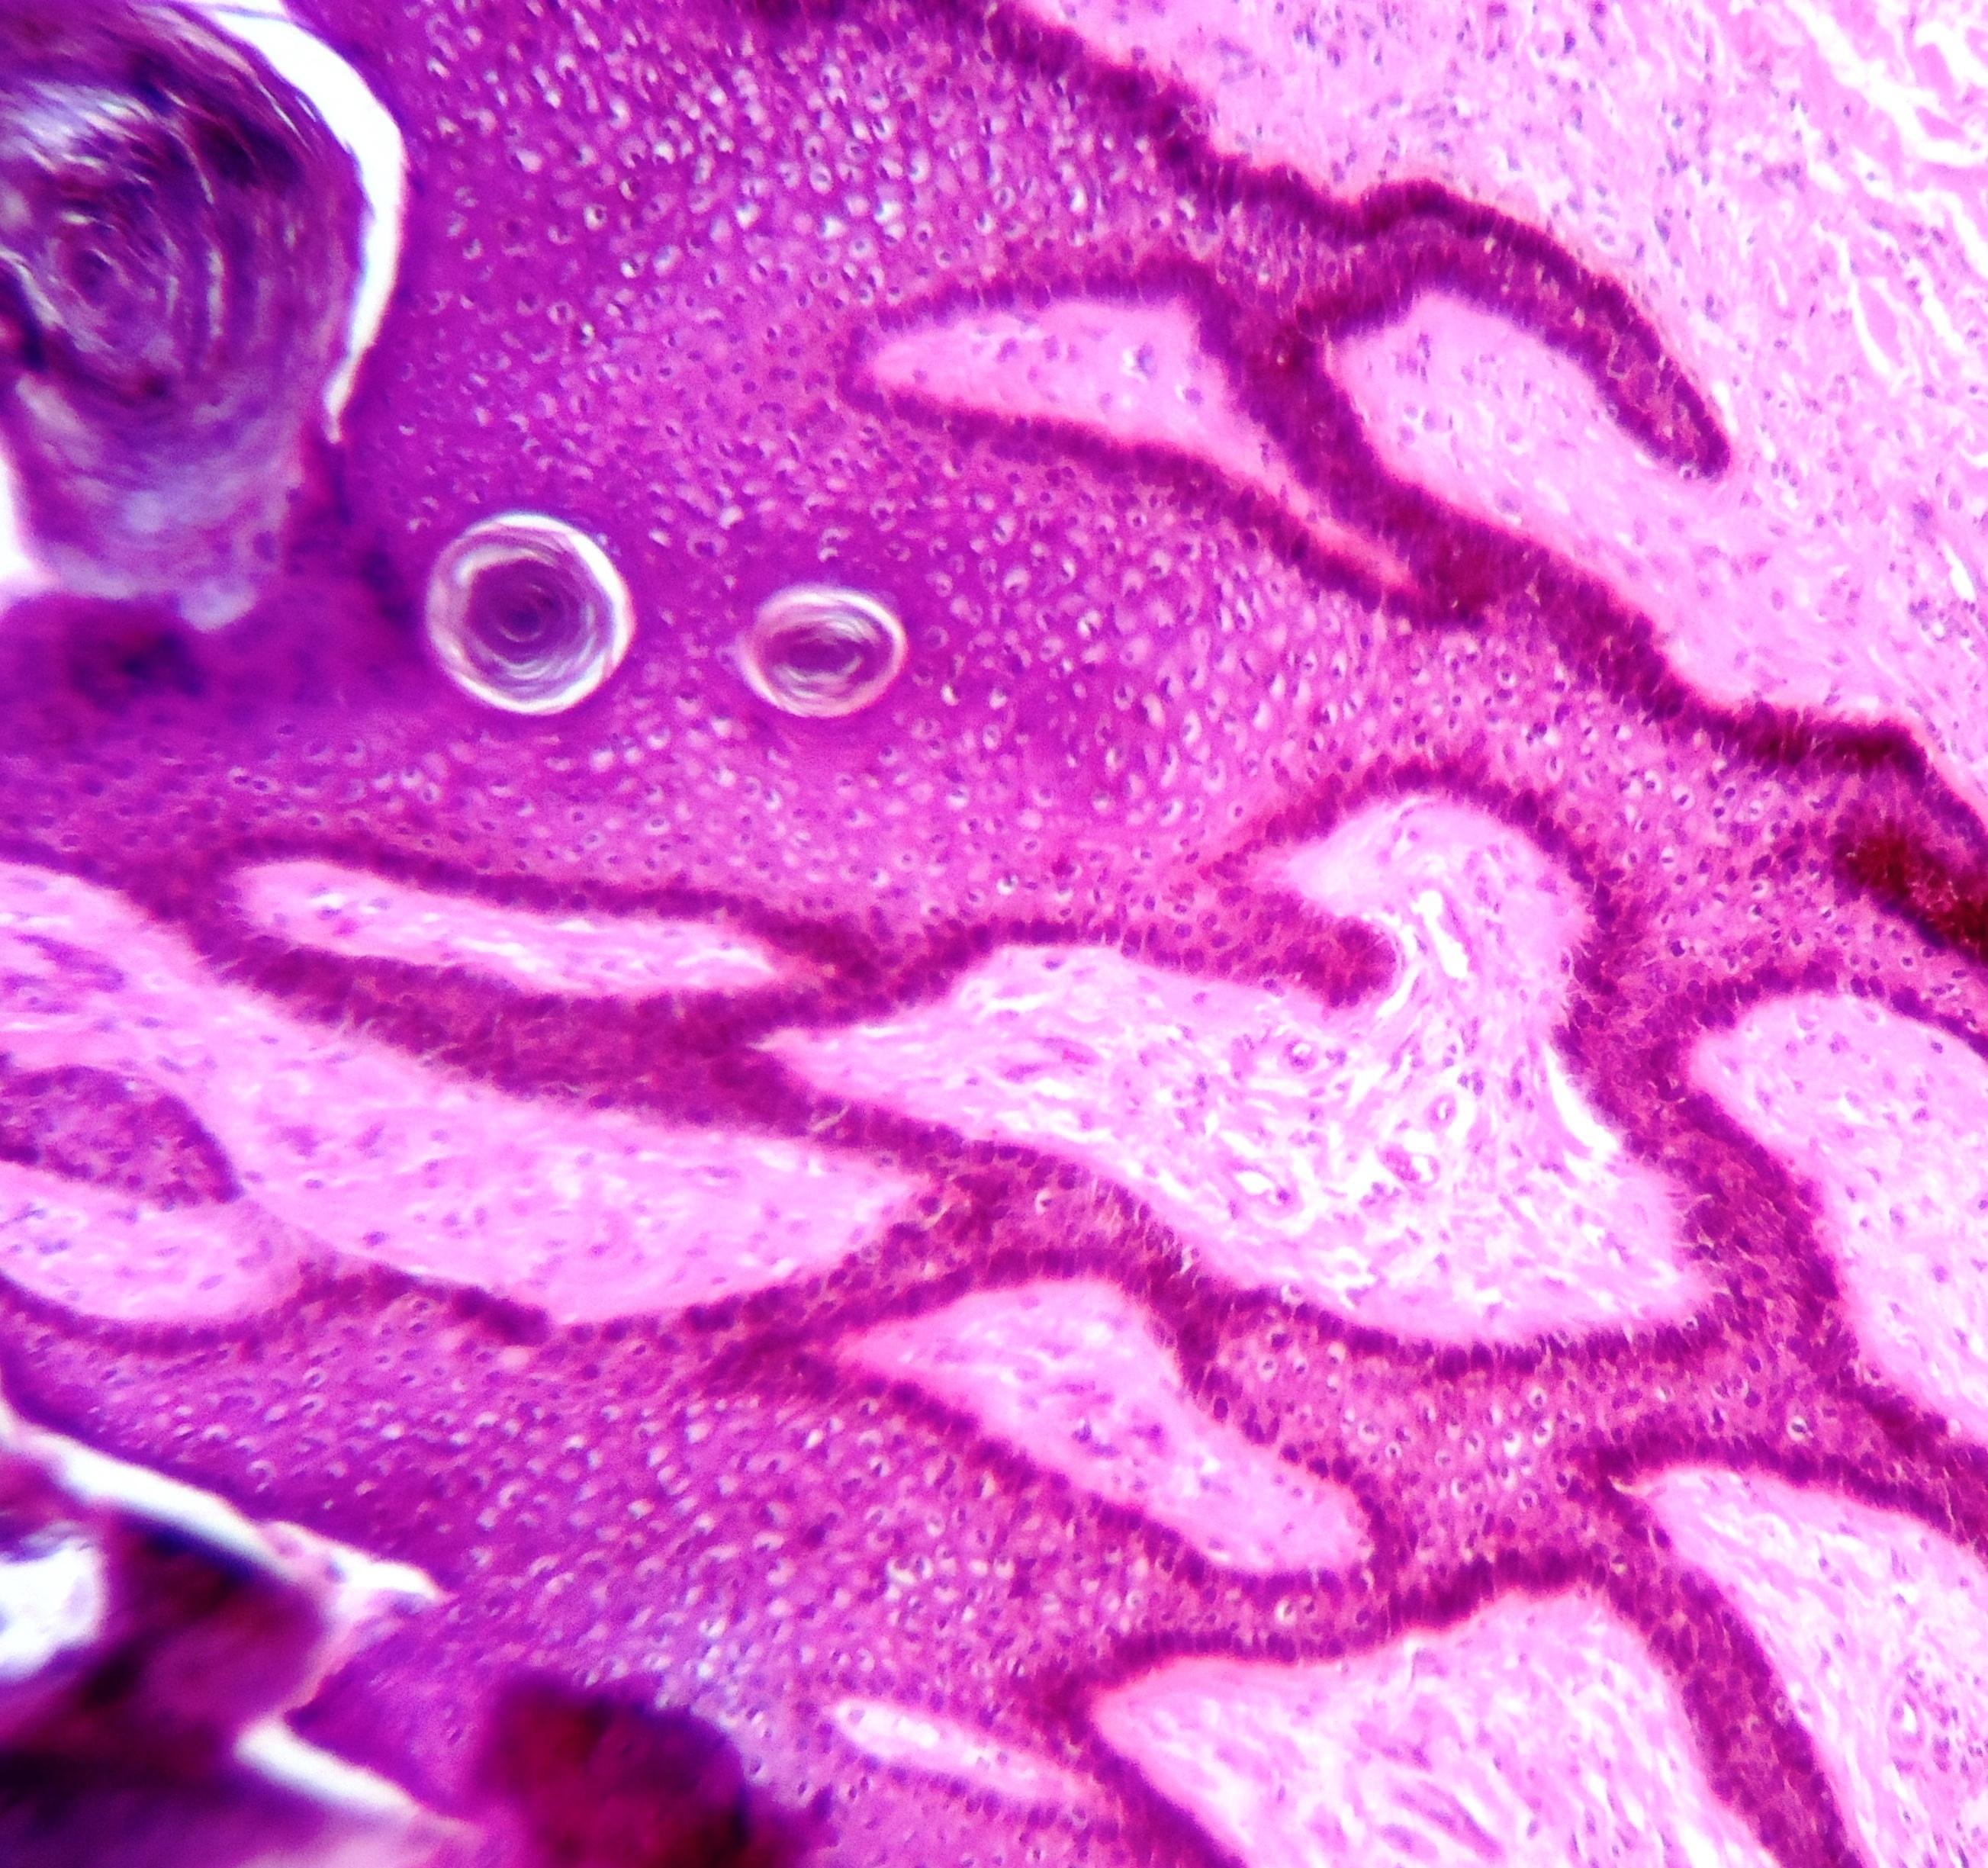 a hüvelyi condyloma papilloma